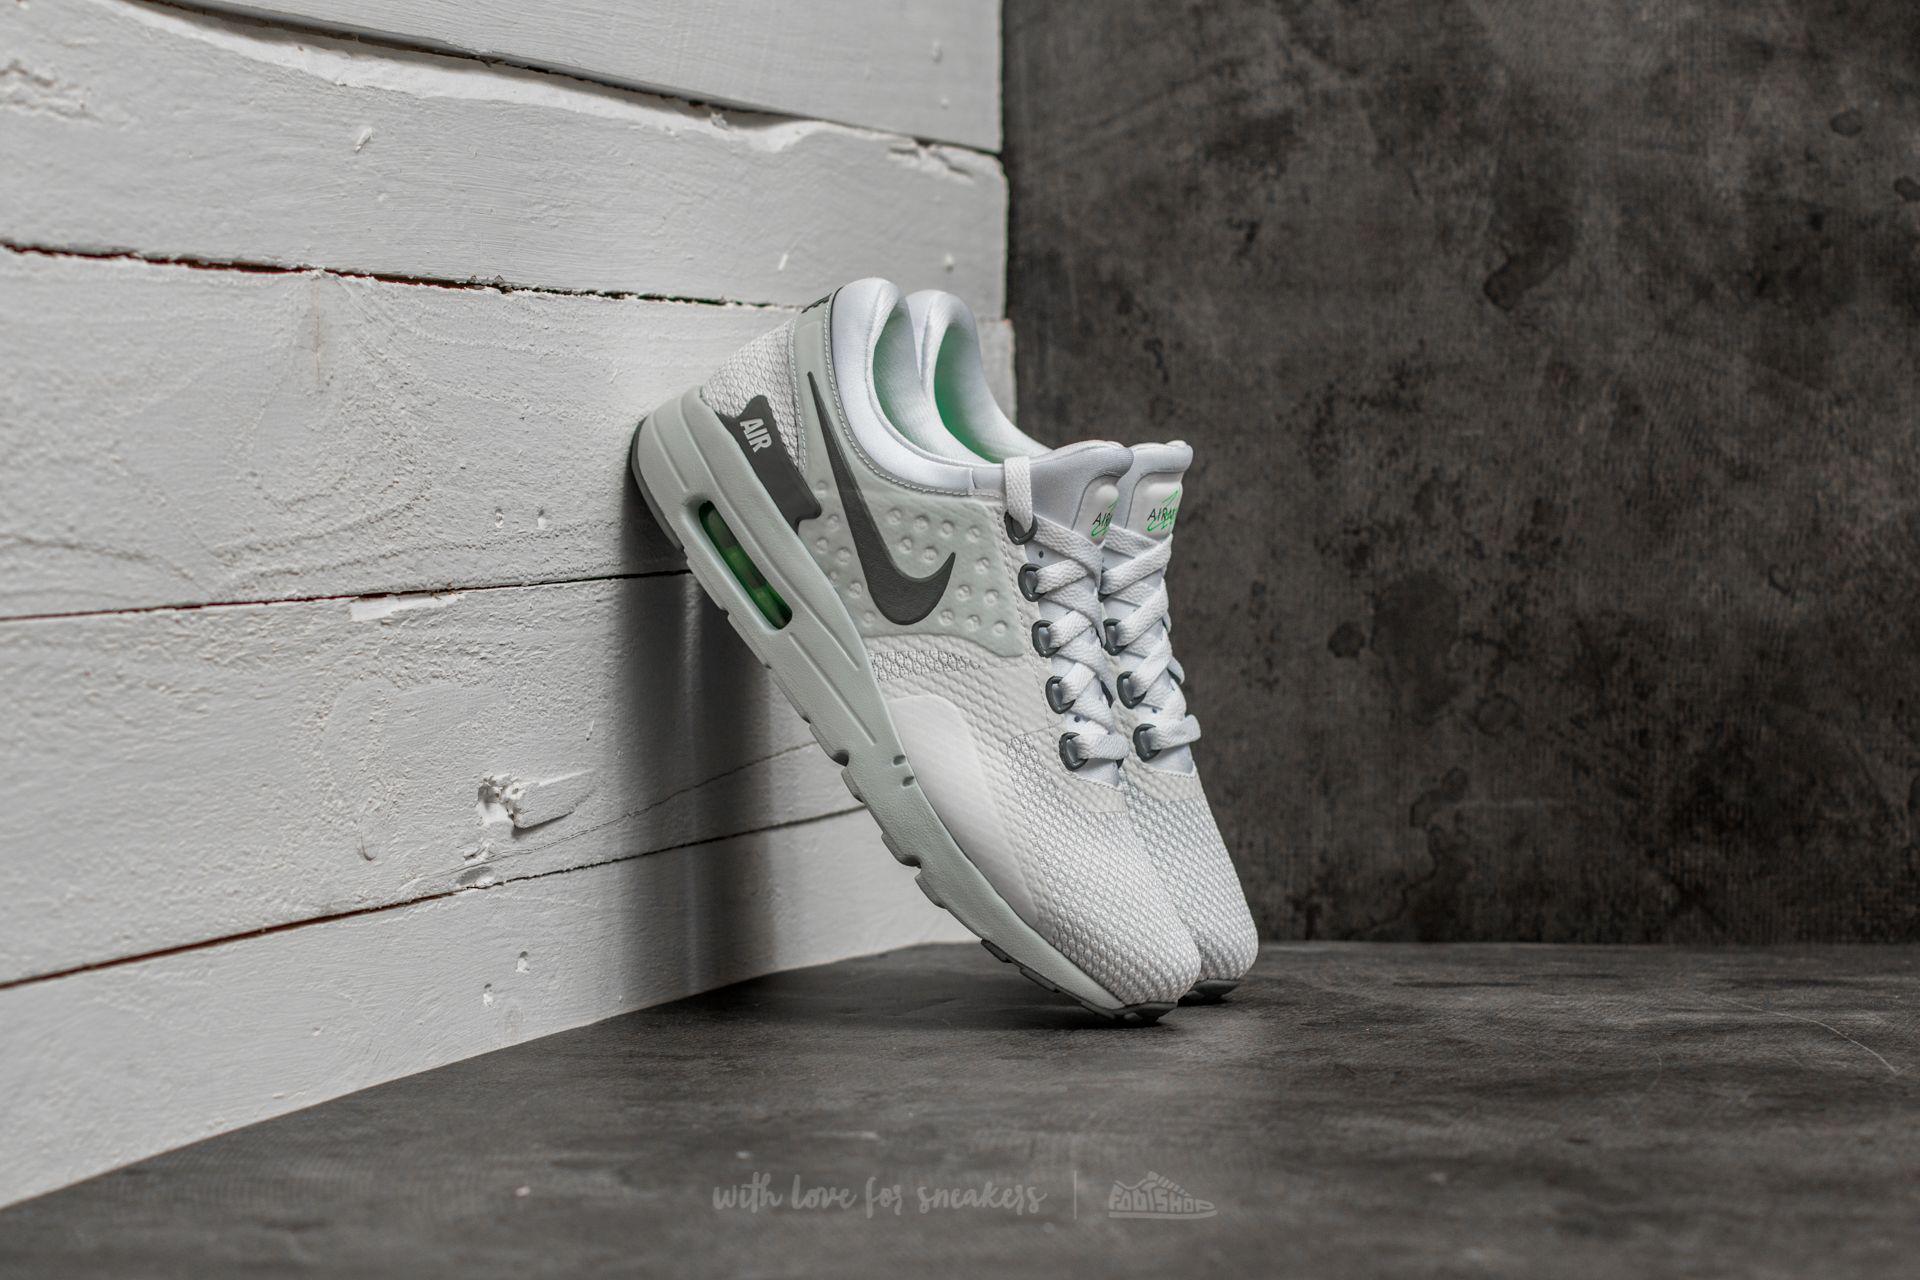 Lyst - Nike Air Max Zero Essential White  Cool Grey-pure Platinum in ... 1dc96b0a7